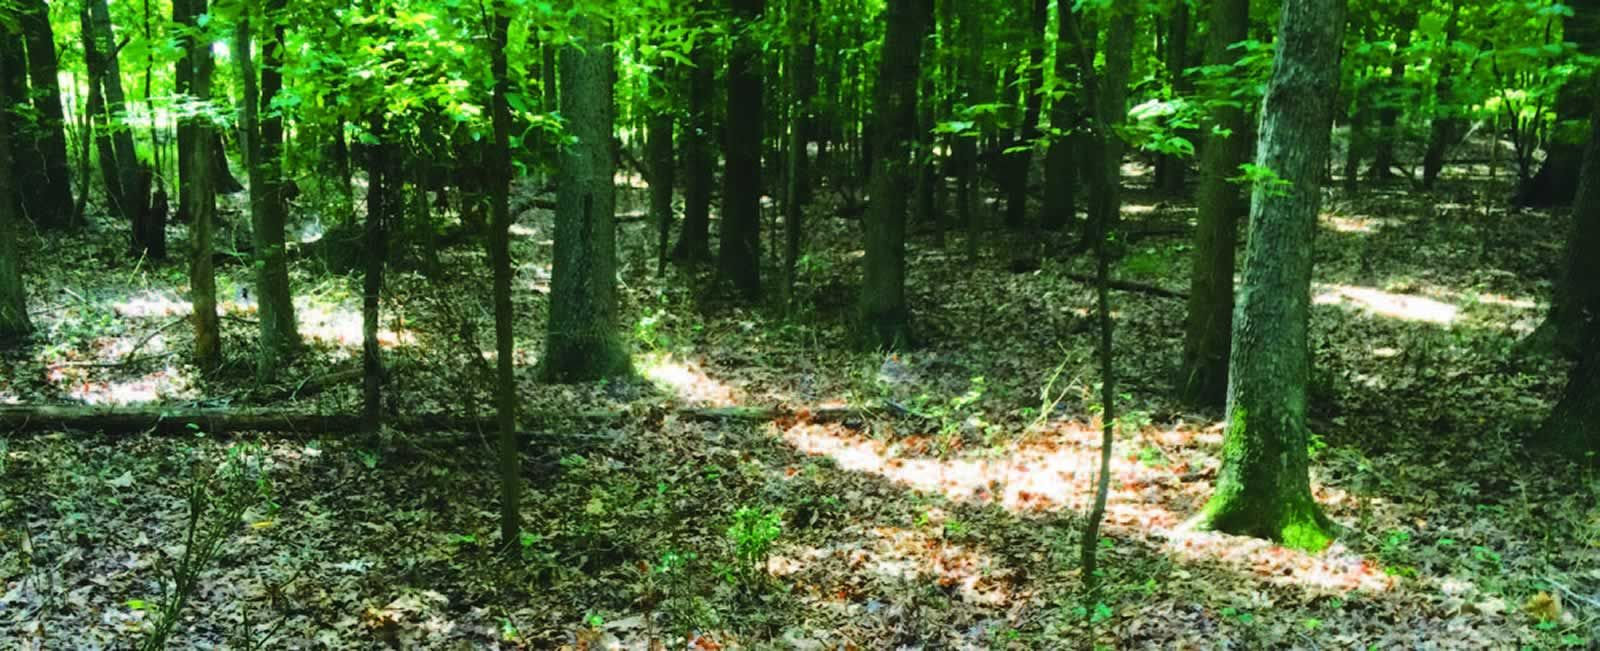 Deer-ravaged forest understory. NY DEC